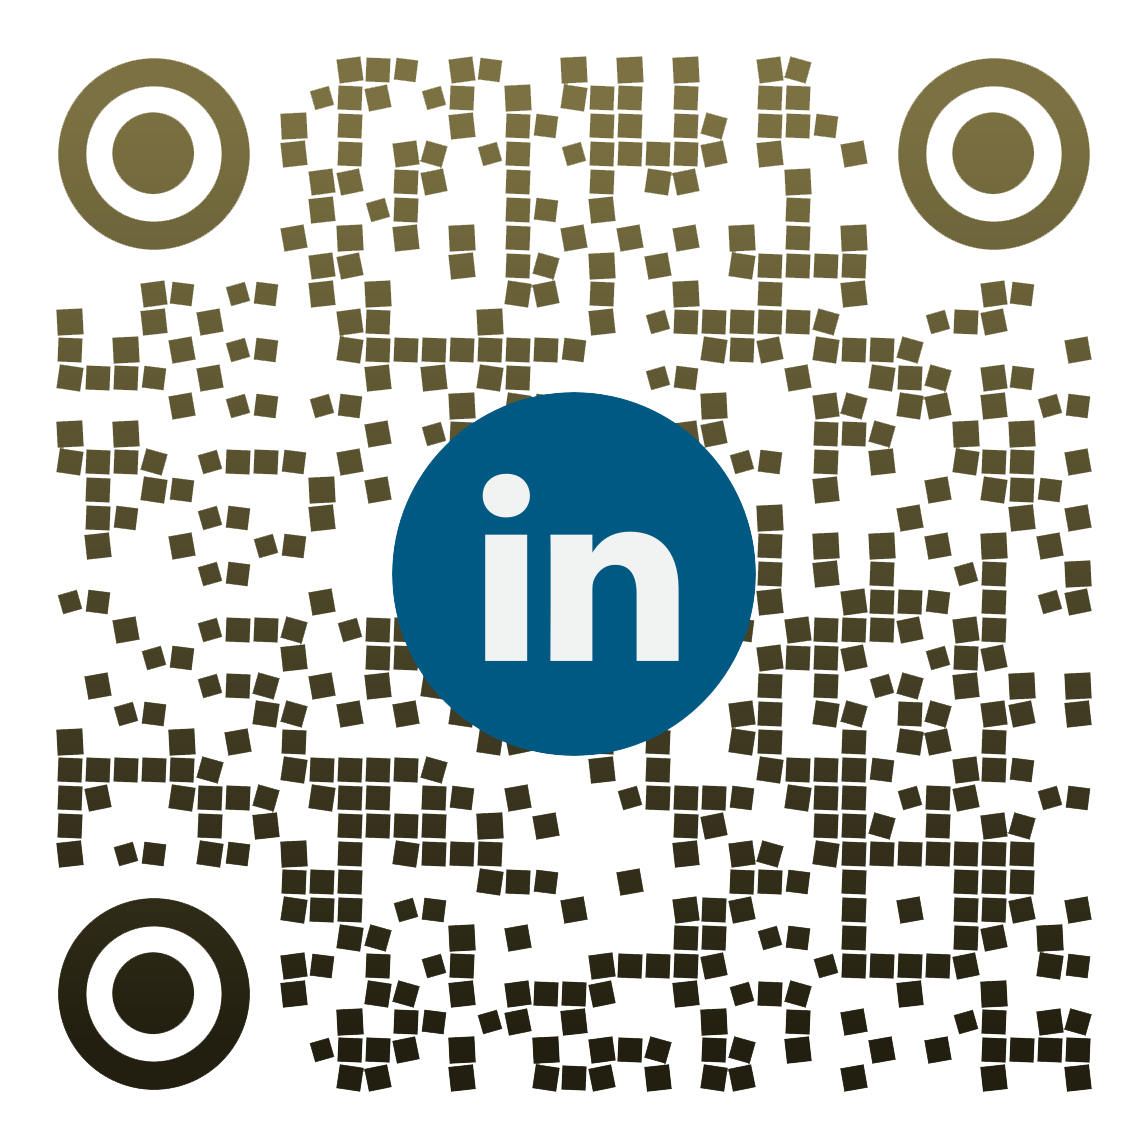 My LinkedIn qr code Address, Amin Monfared.